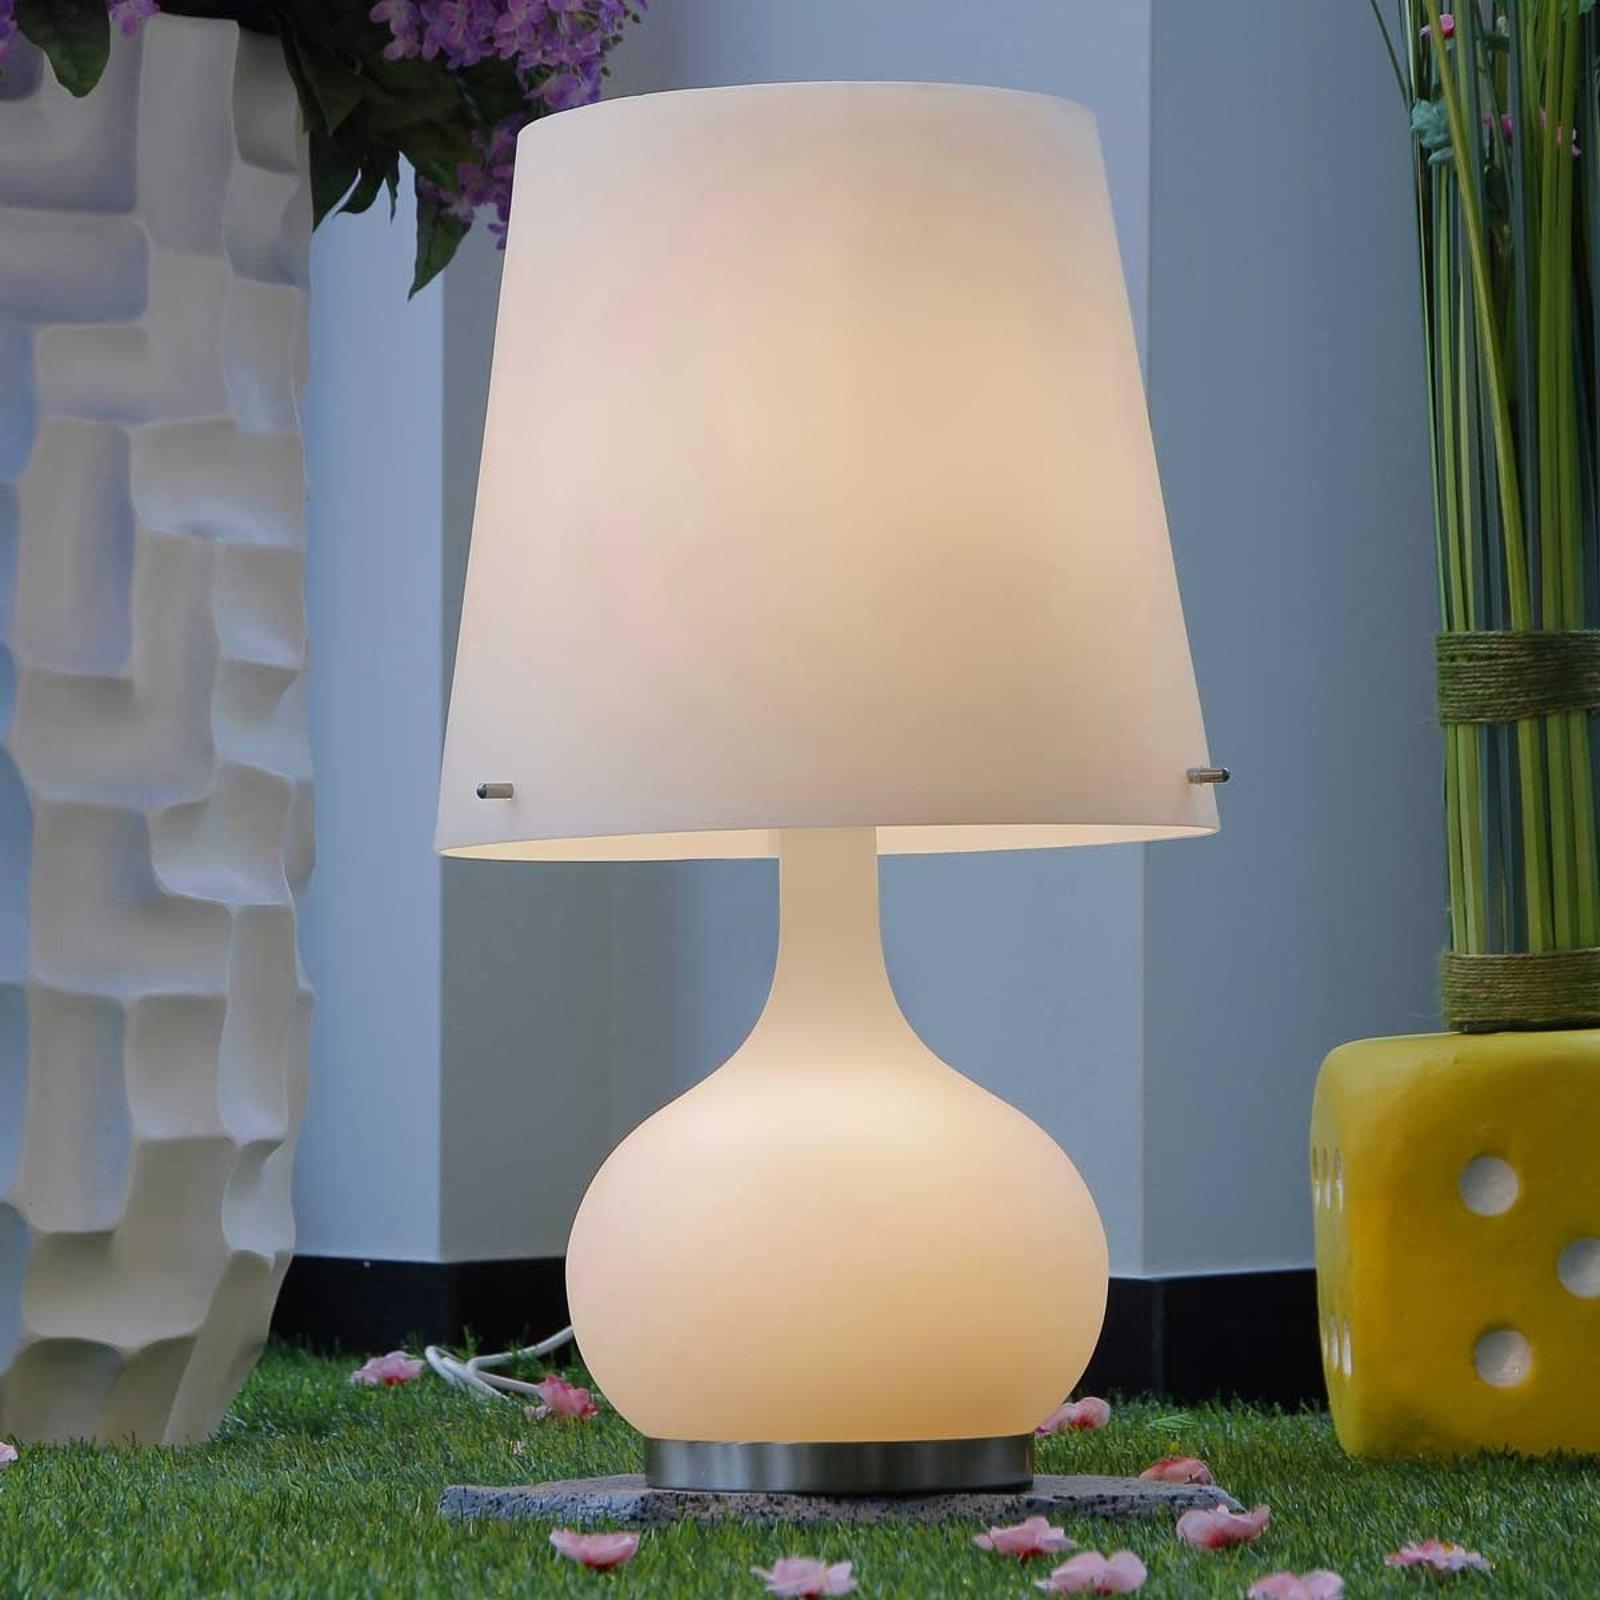 Stolná lampa Ade biela 58cm_3501131_1